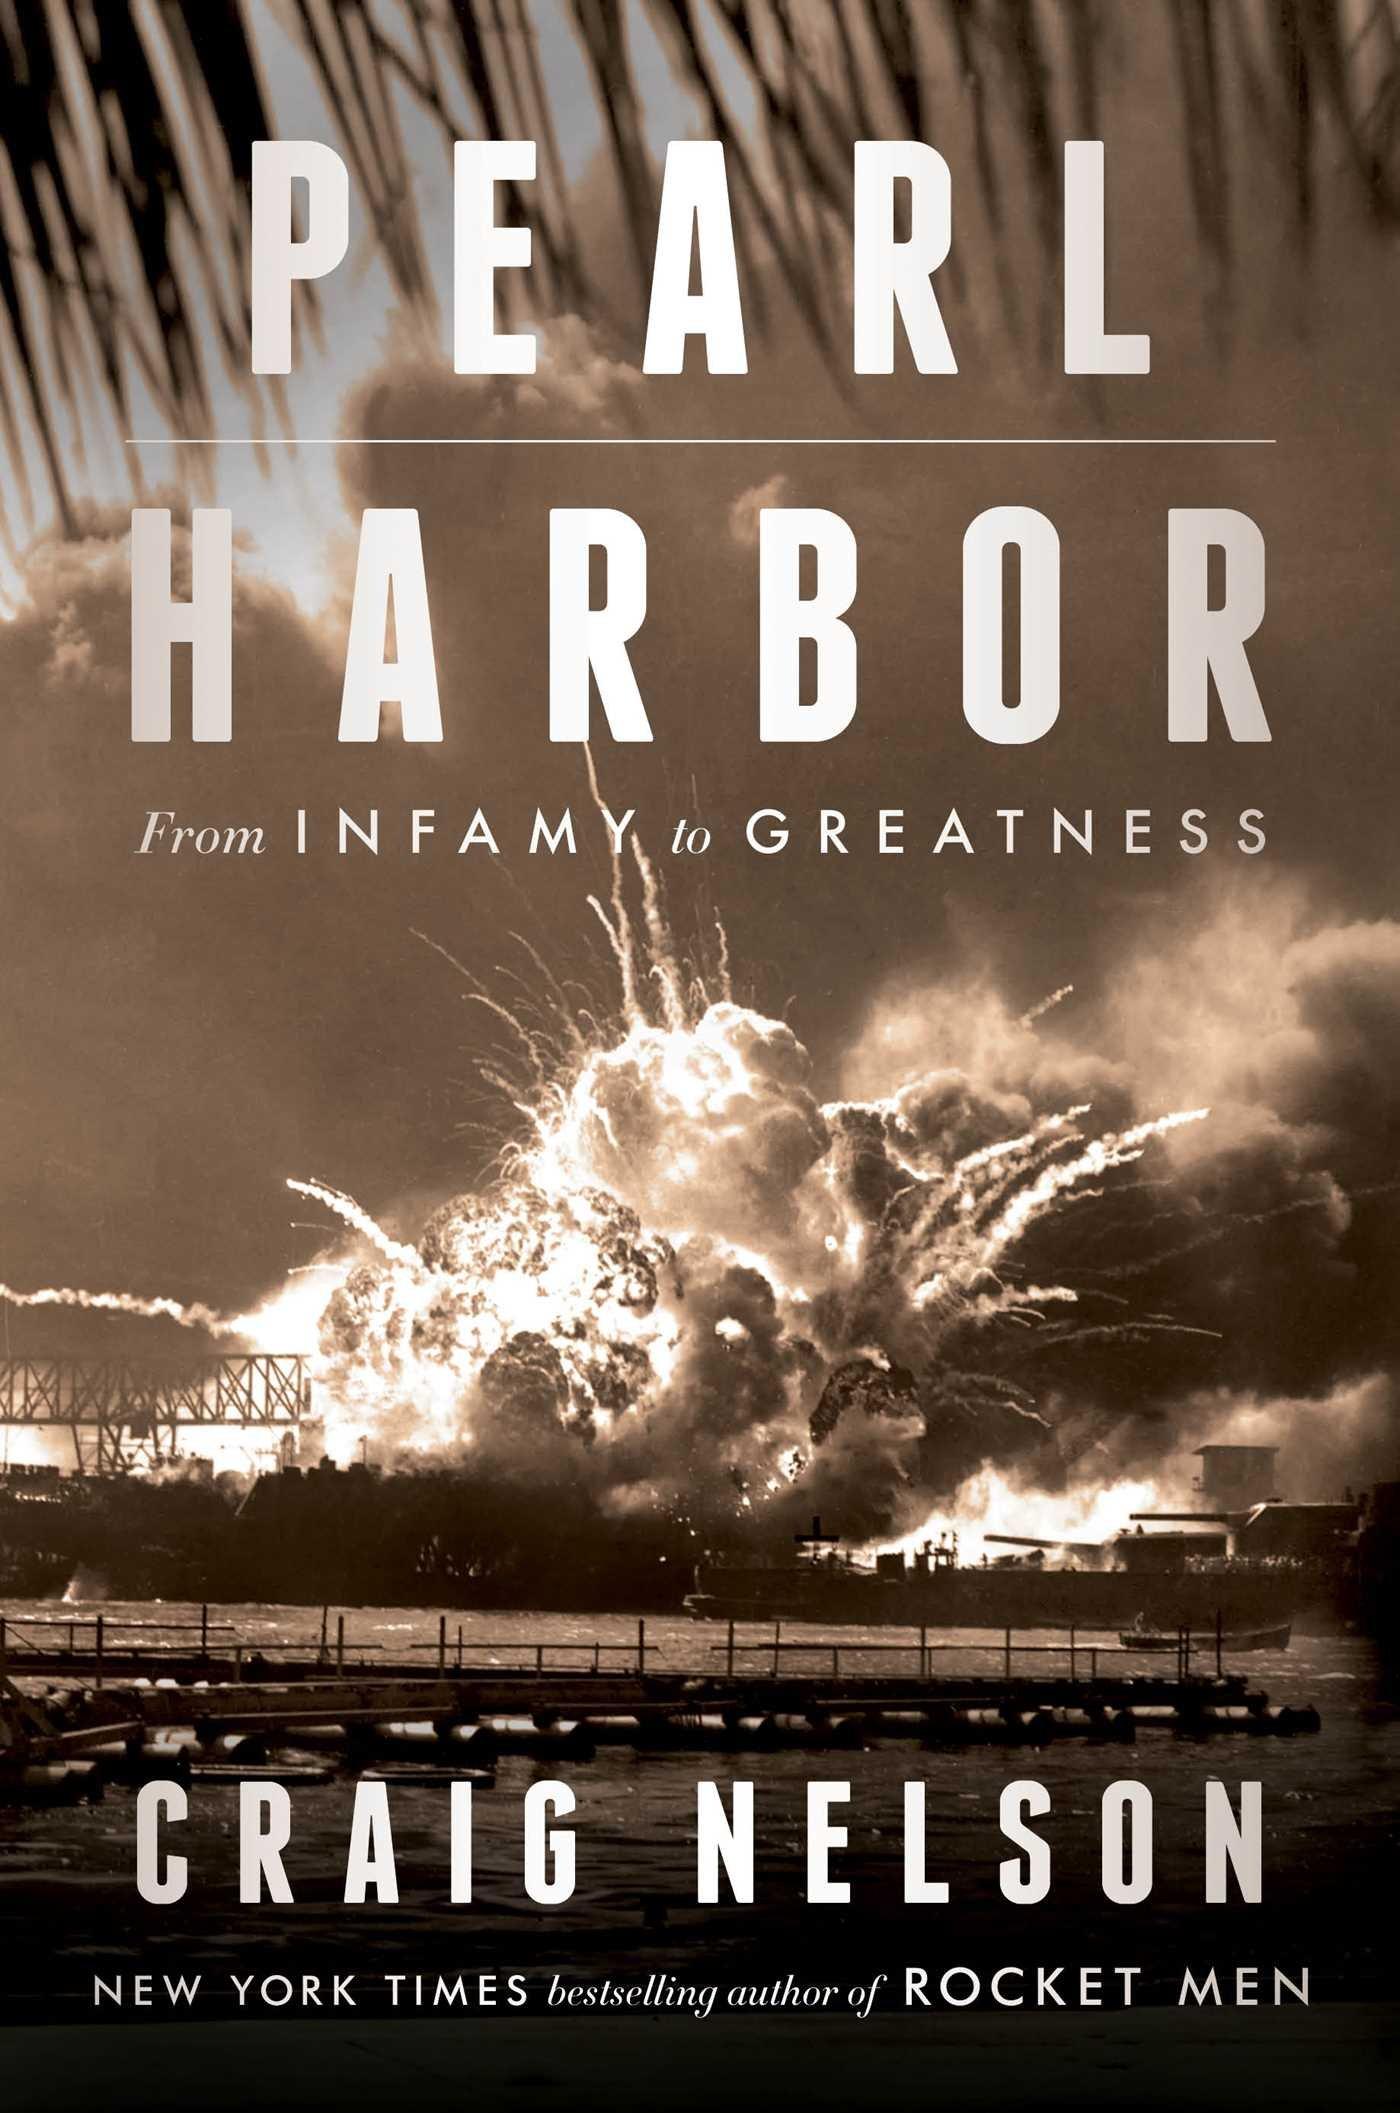 Pearl Harbor Book Cover Image.jpg